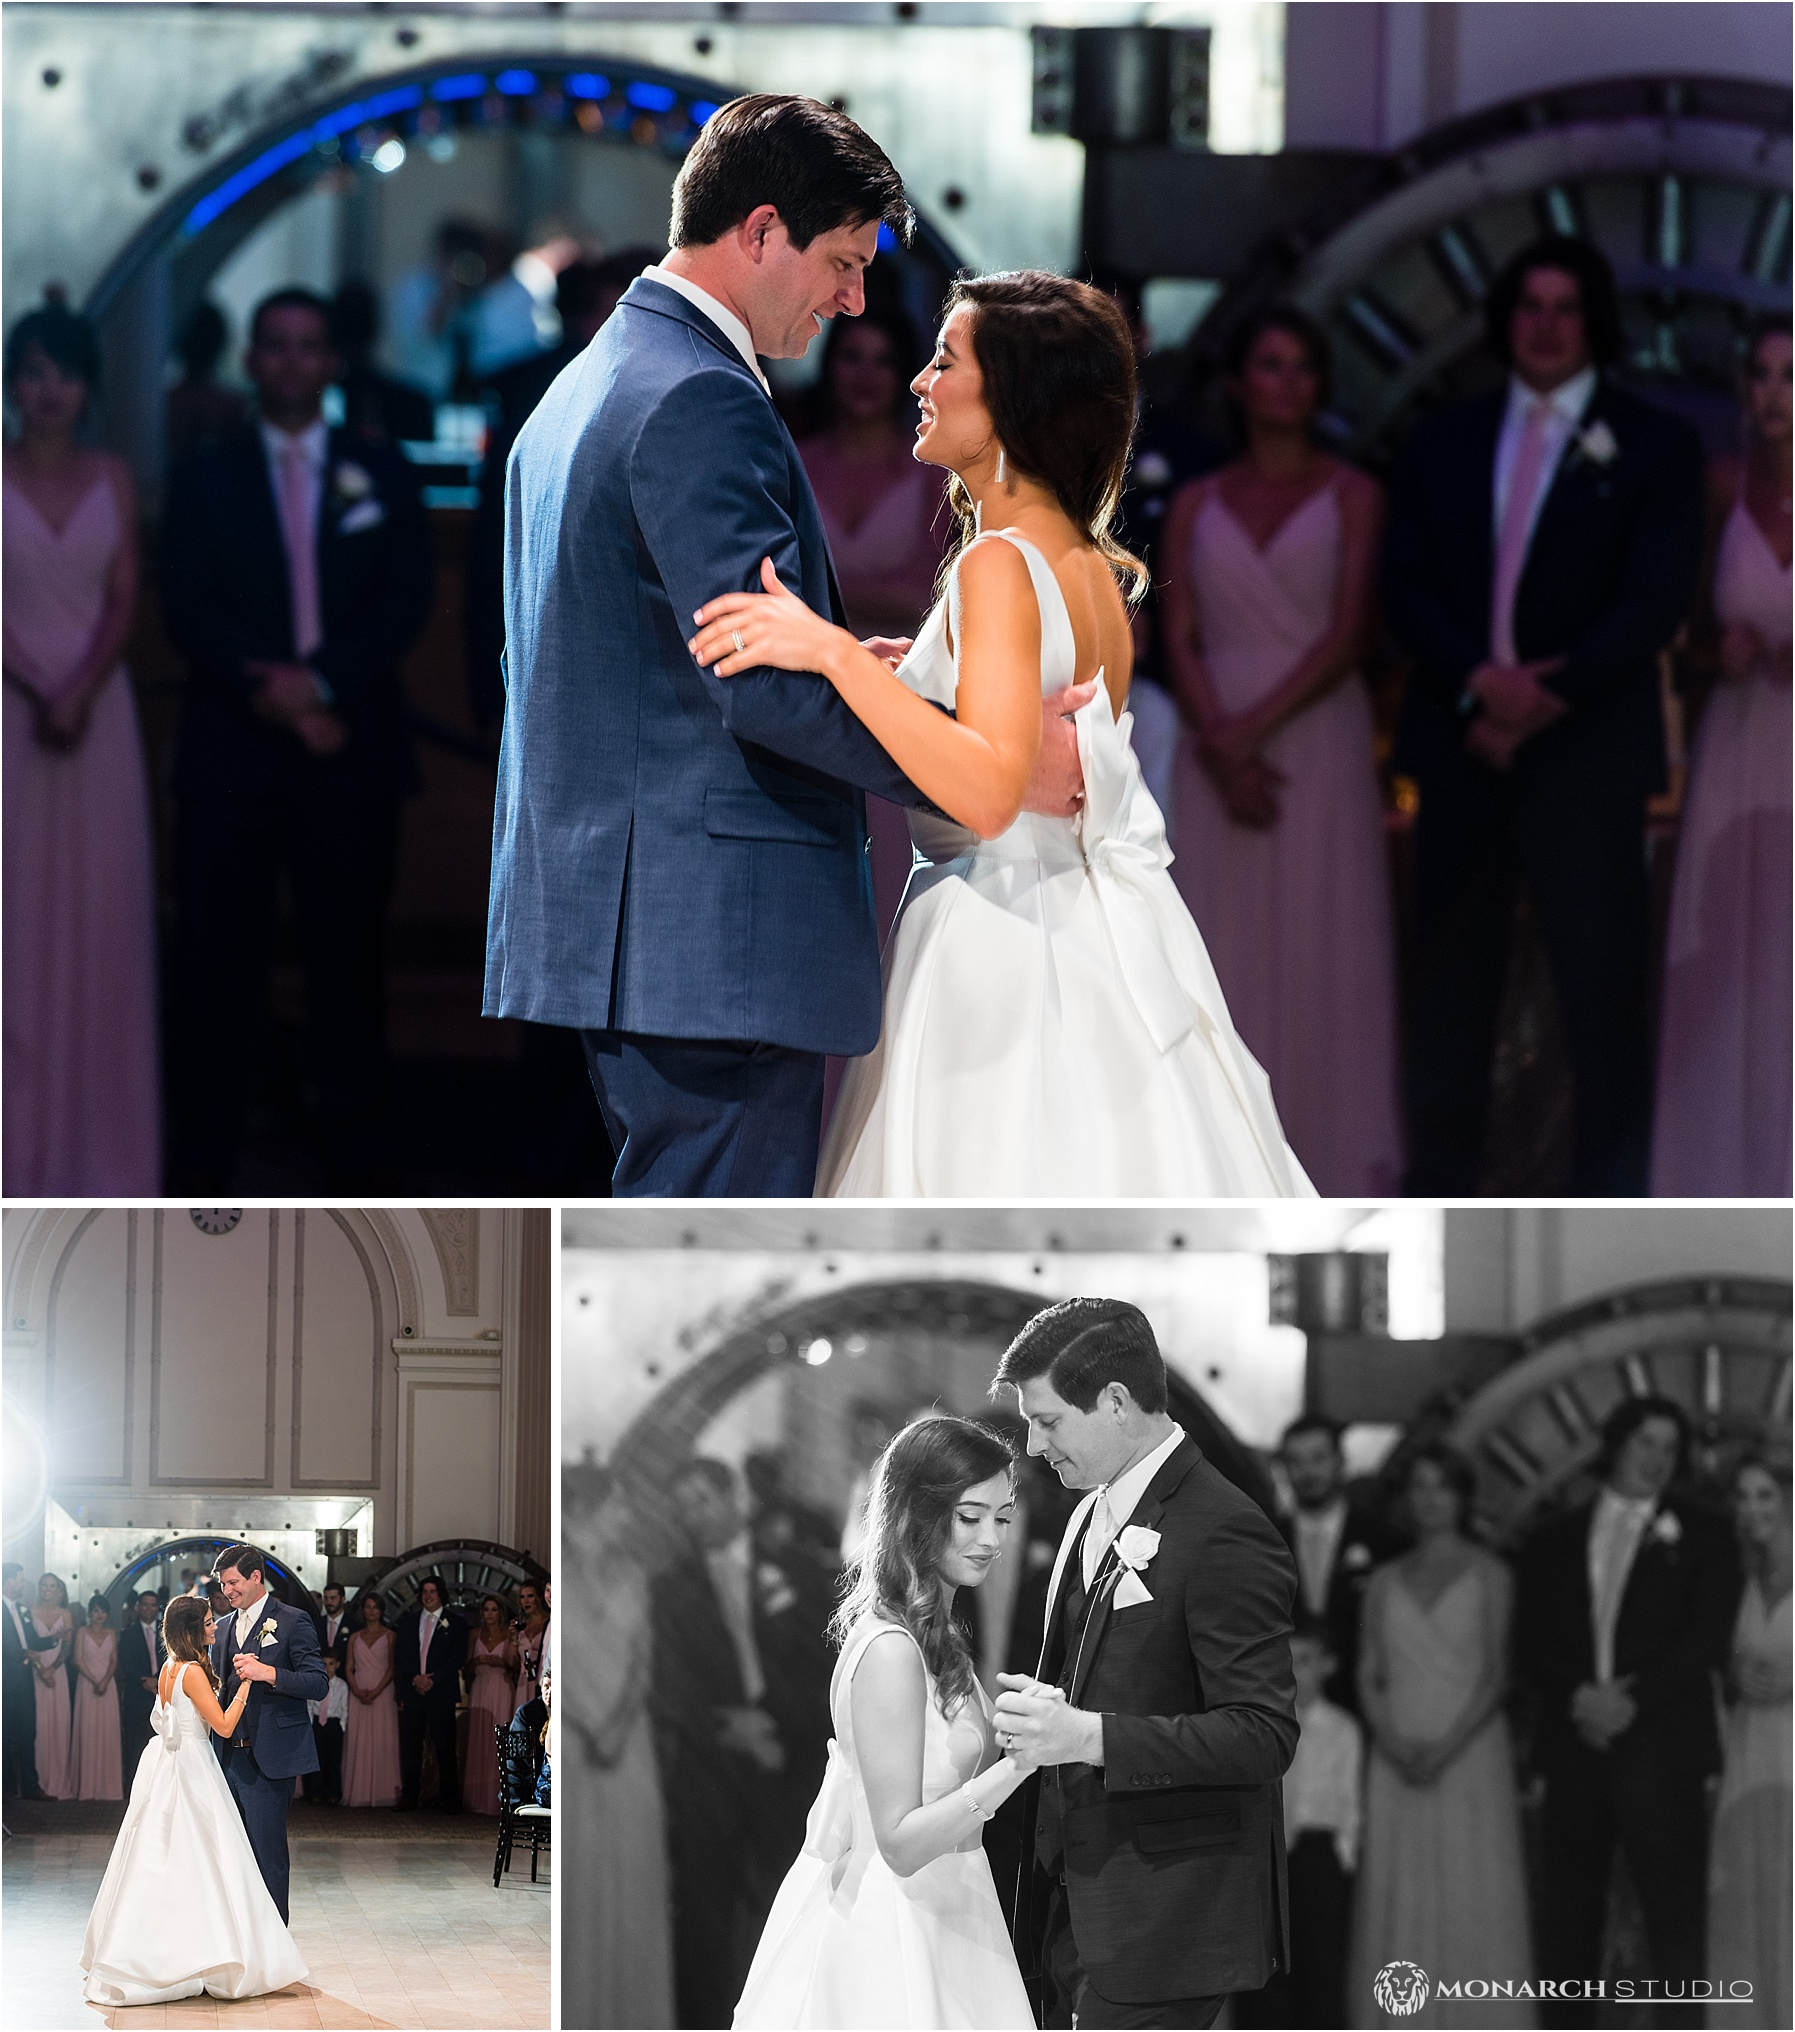 st-augustine-wedding-photographer-109.jpg